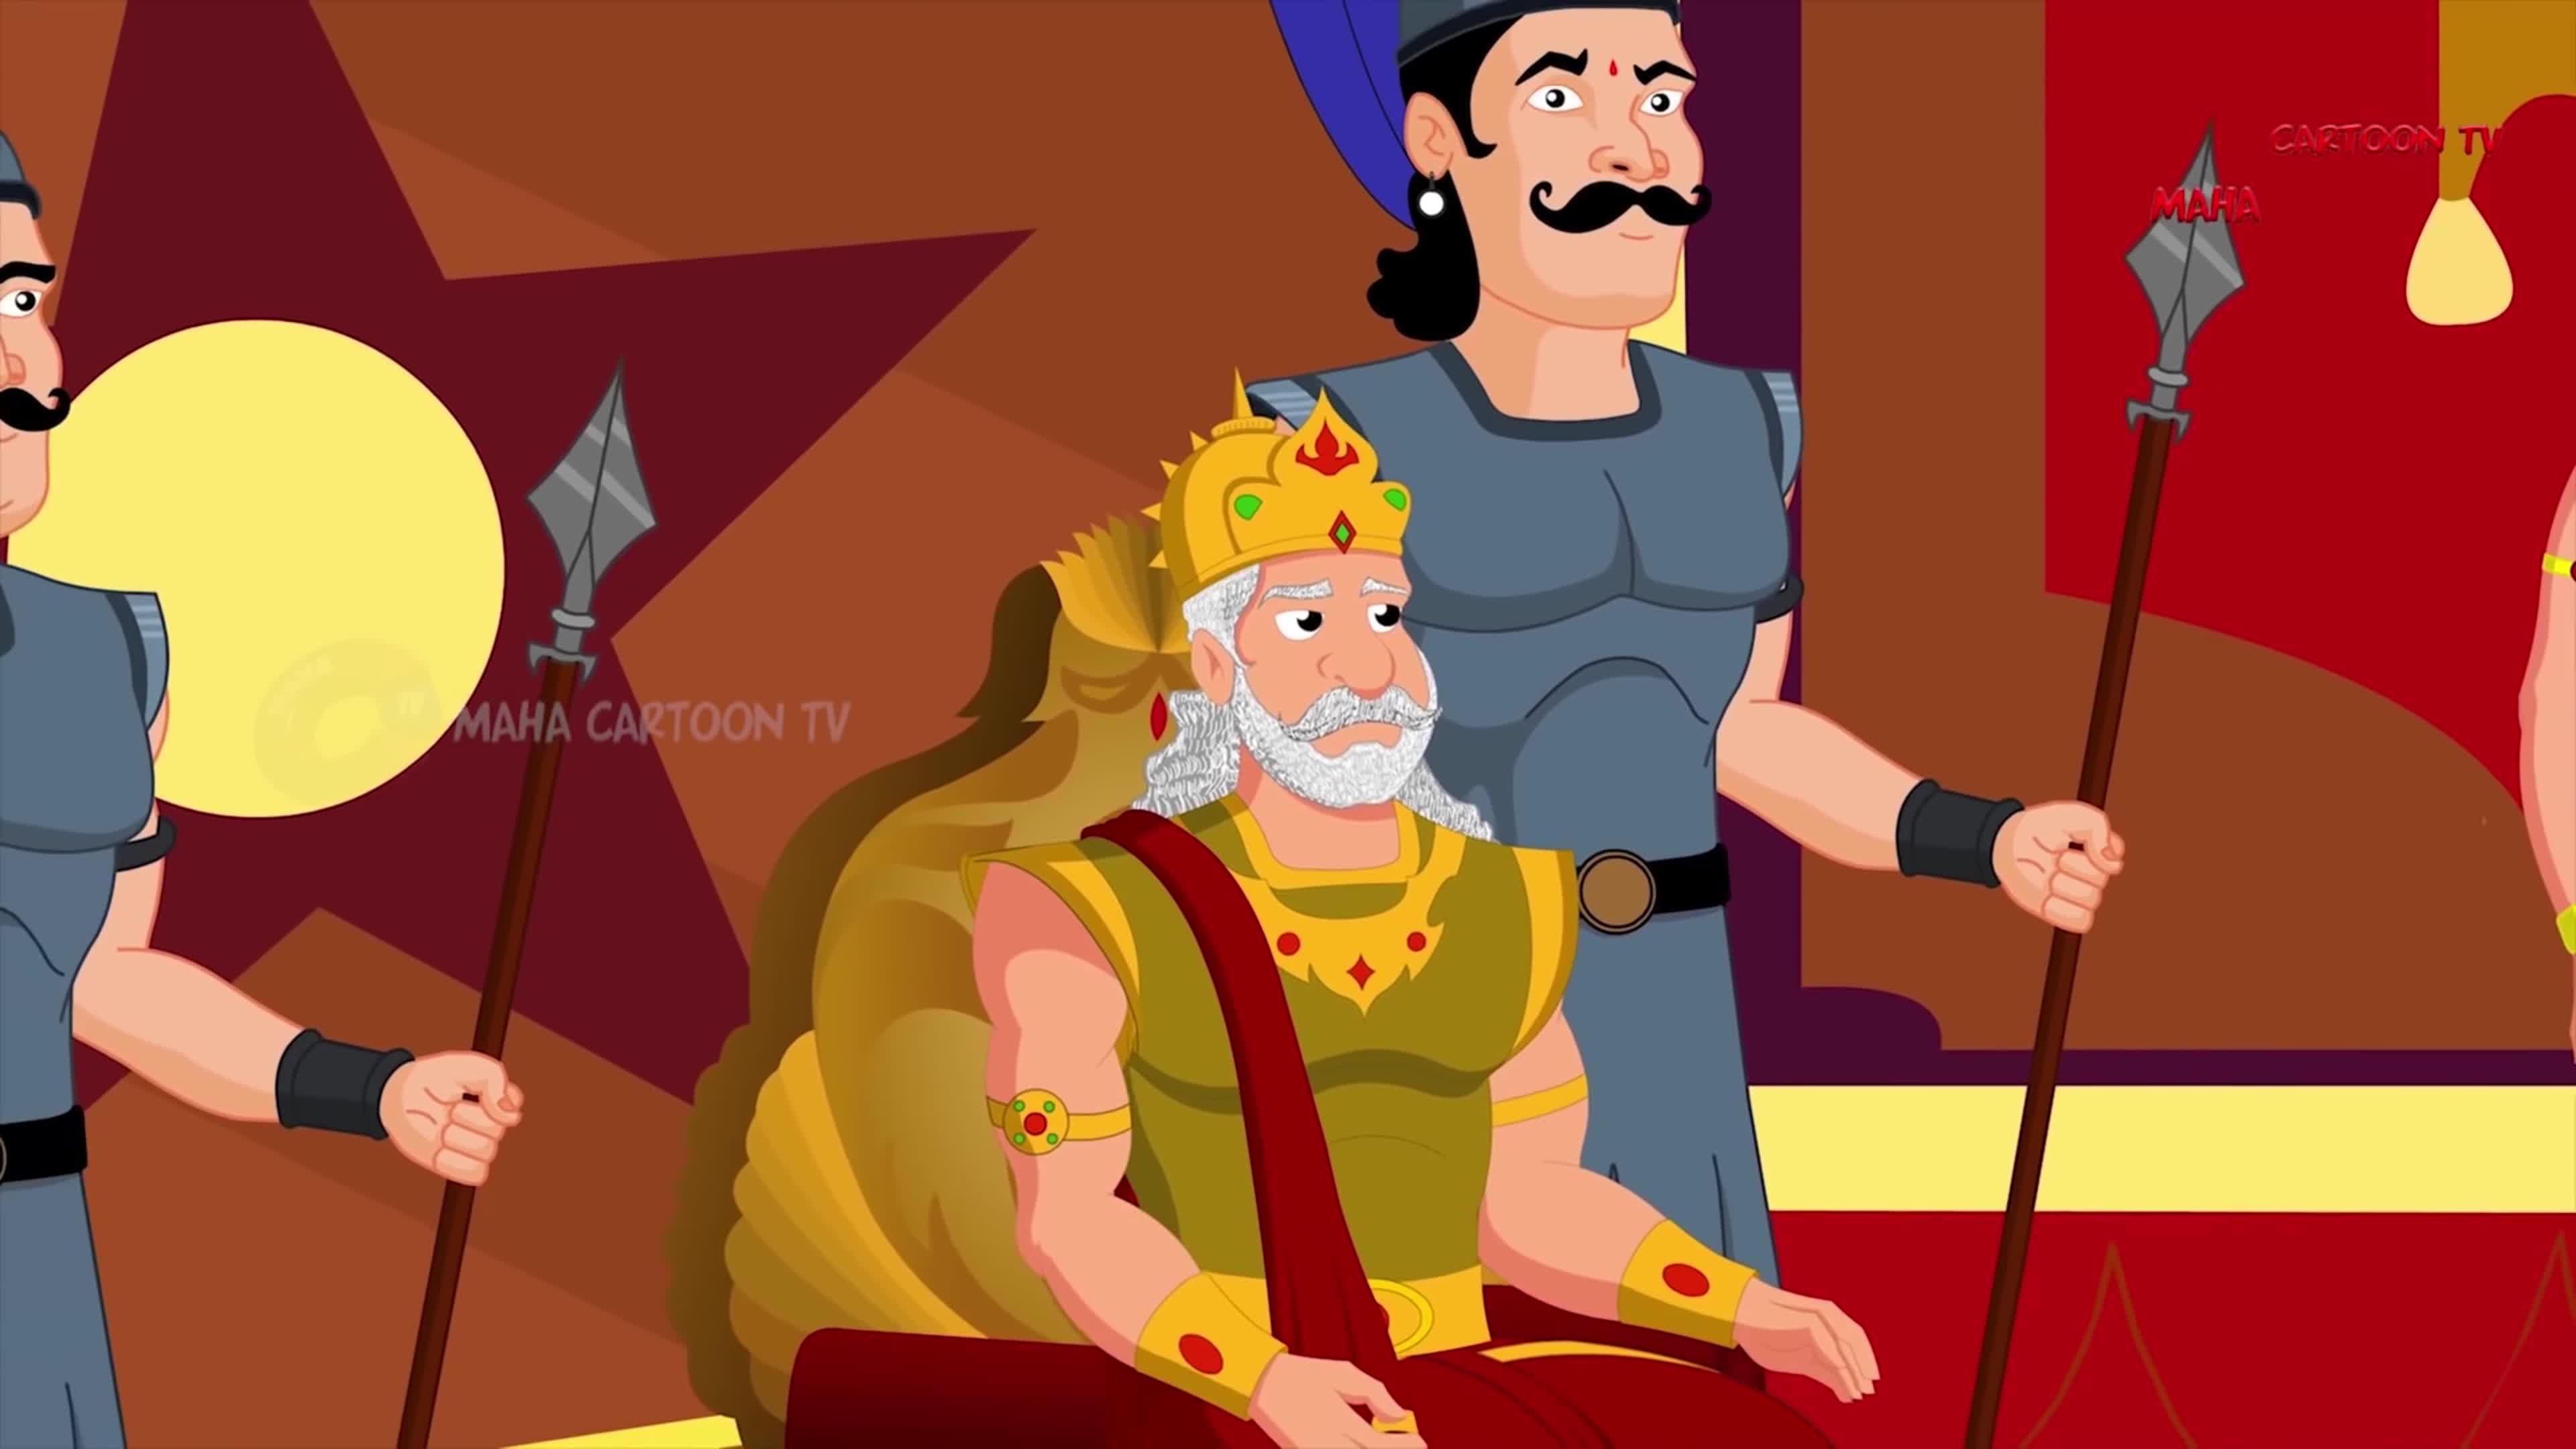 Maha Cartoon Tv Bangla Gifs Search   Search & Share on Homdor